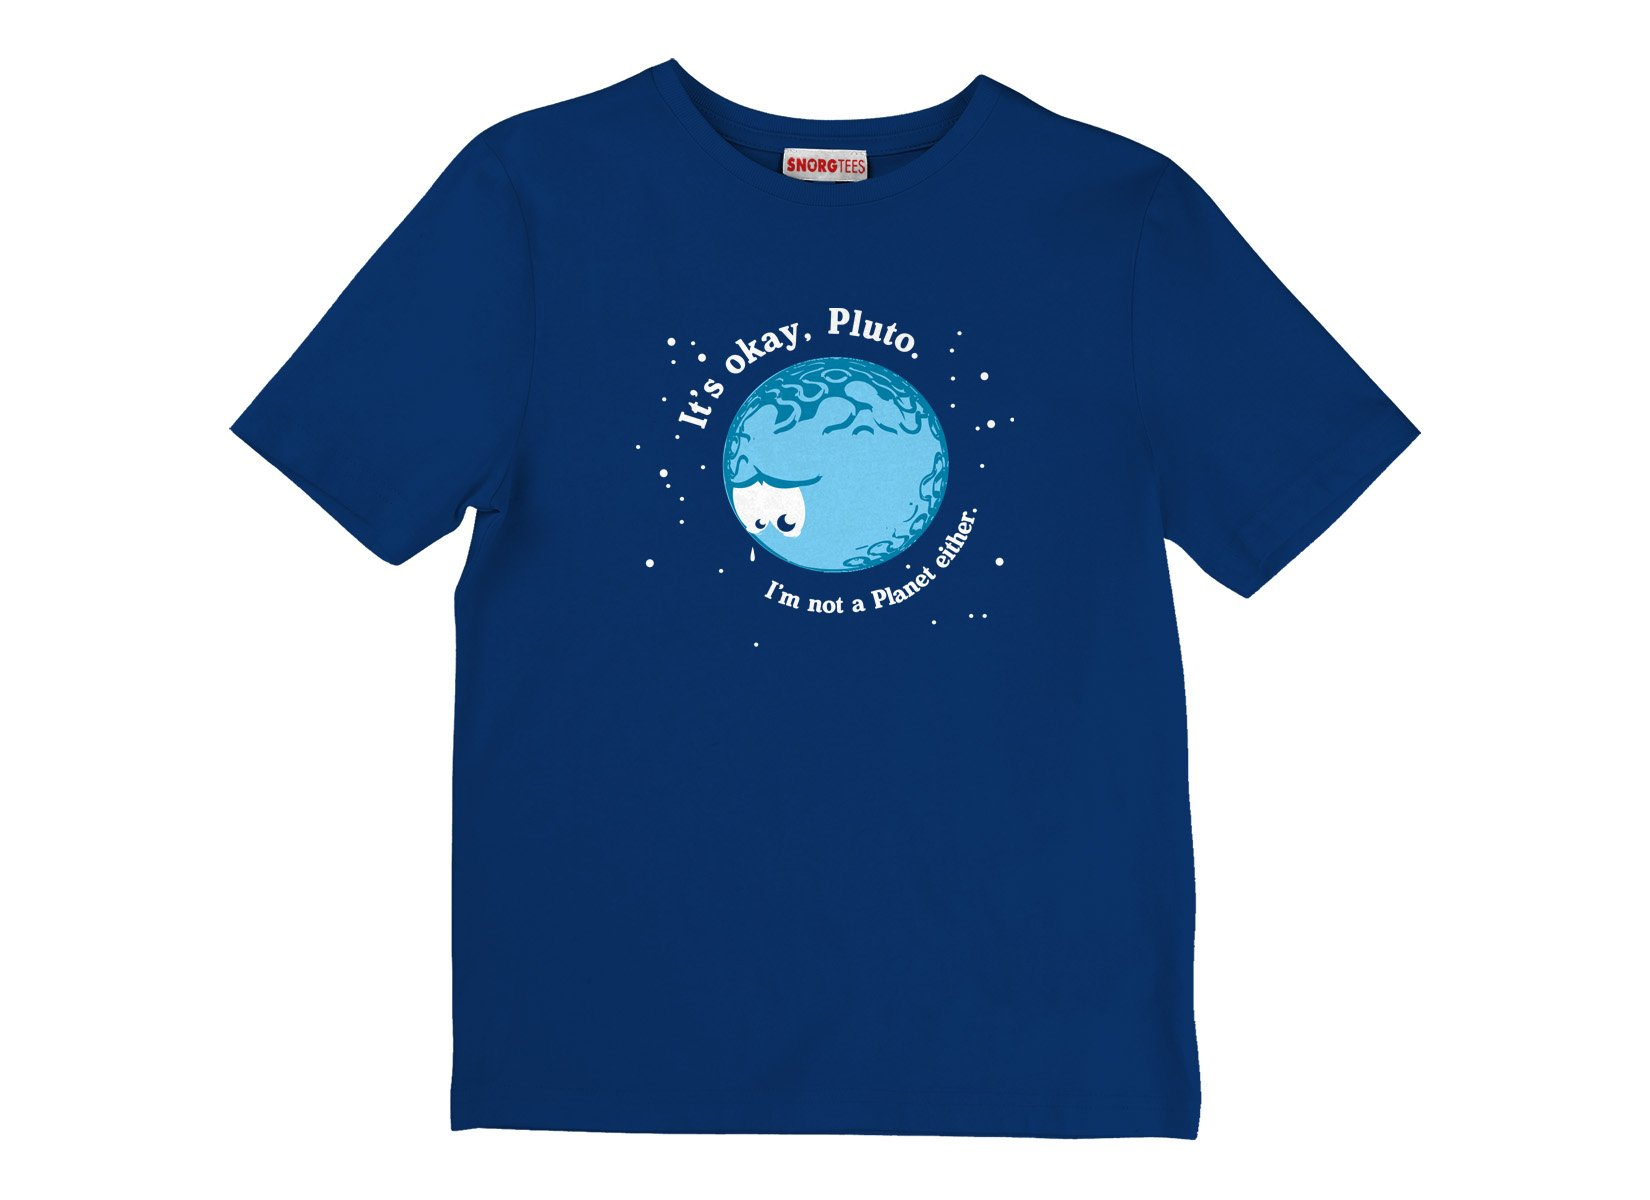 It's Okay Pluto on Kids T-Shirt